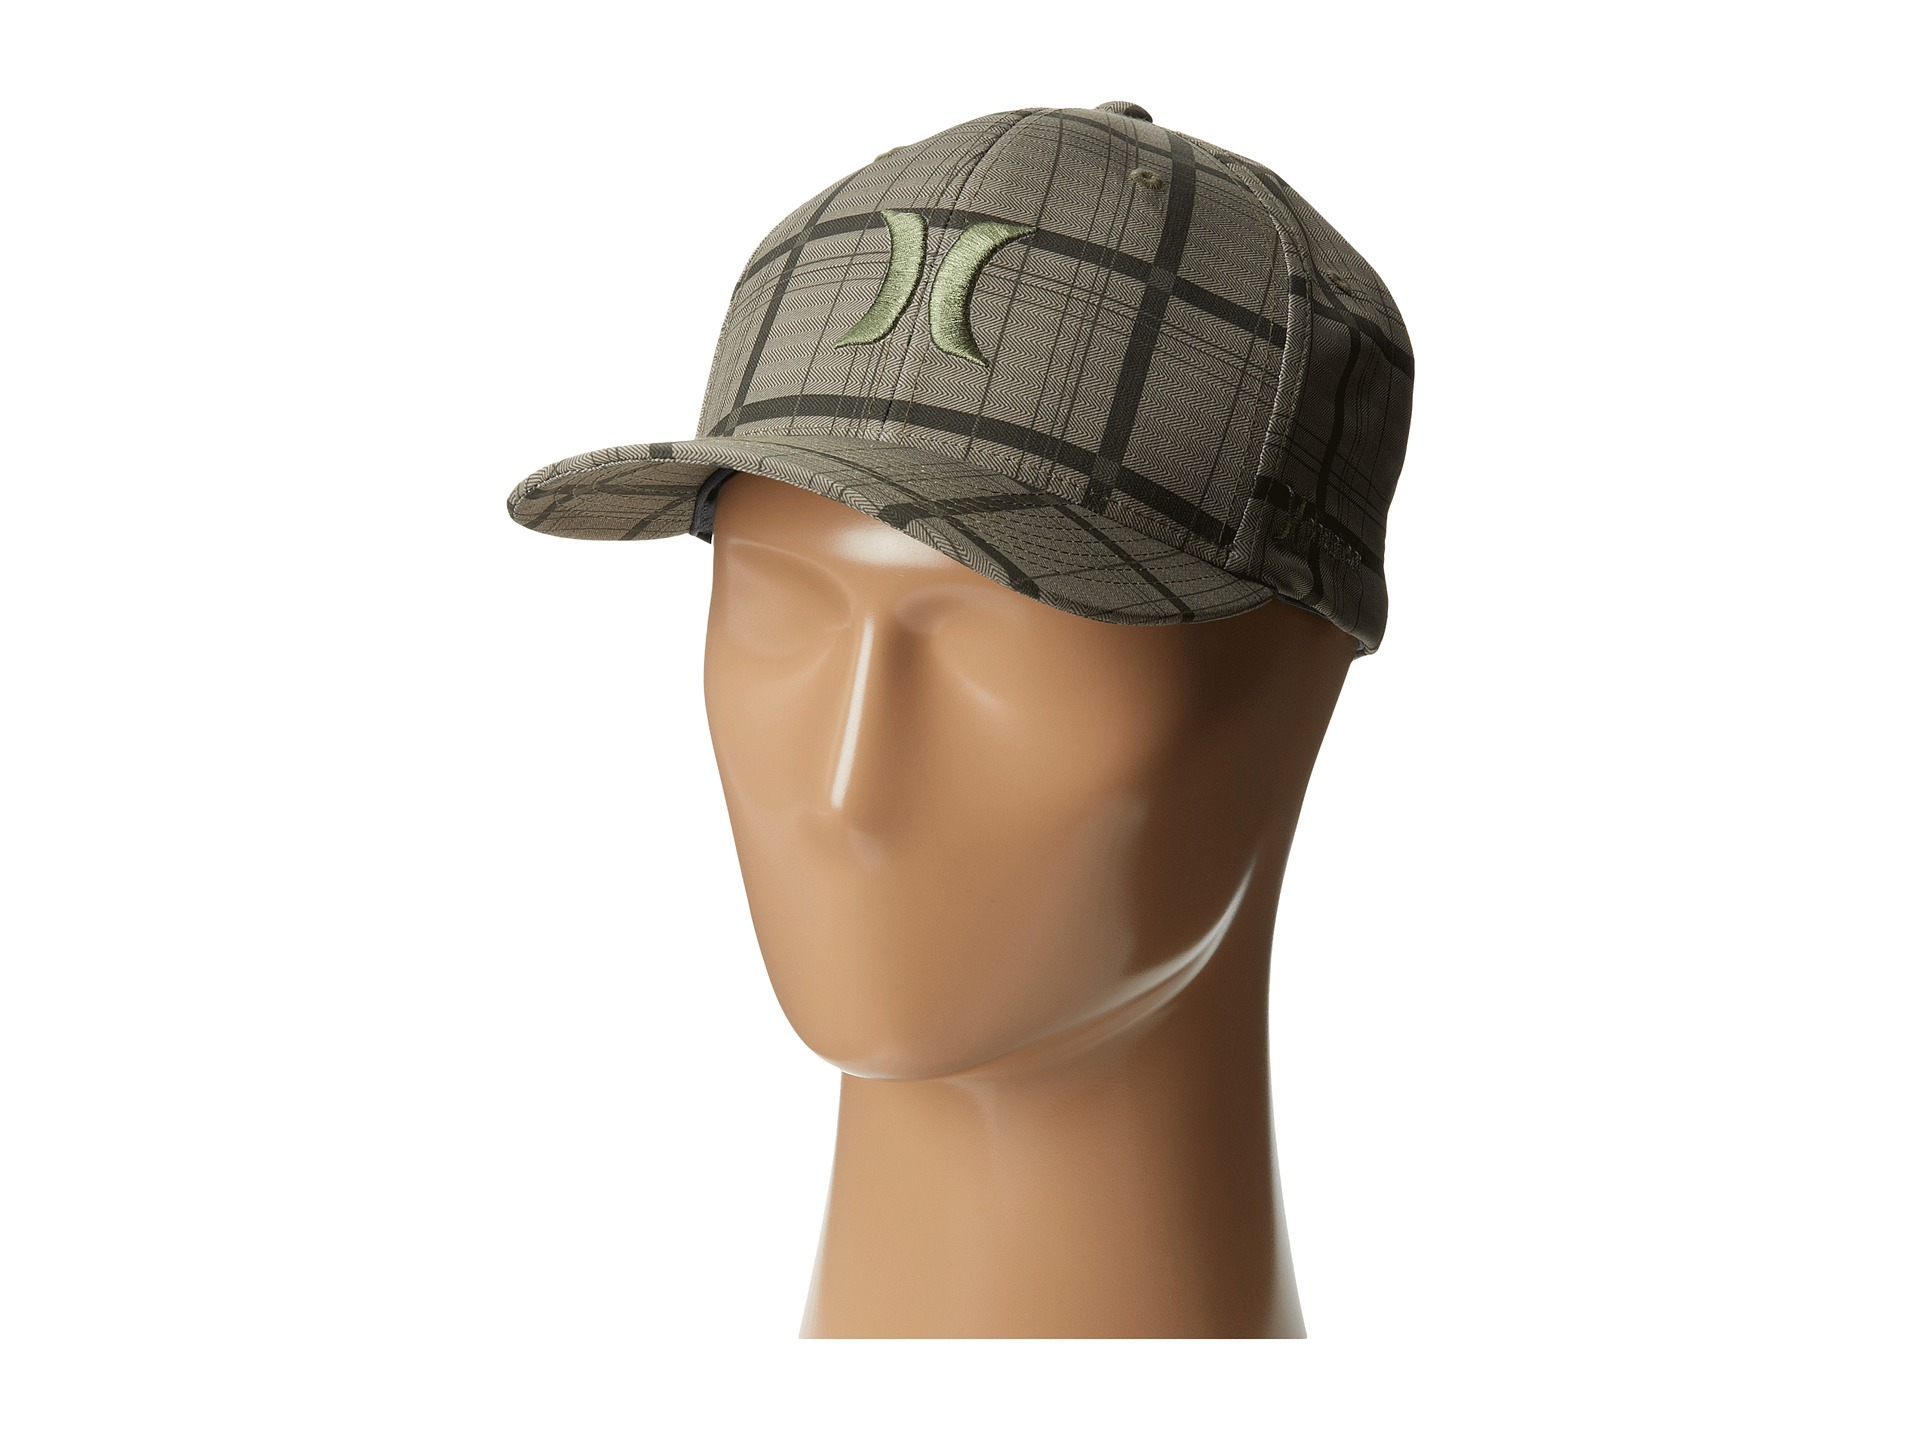 fcc18de93 coupon code for hurley plaid hat a6dbc 59546